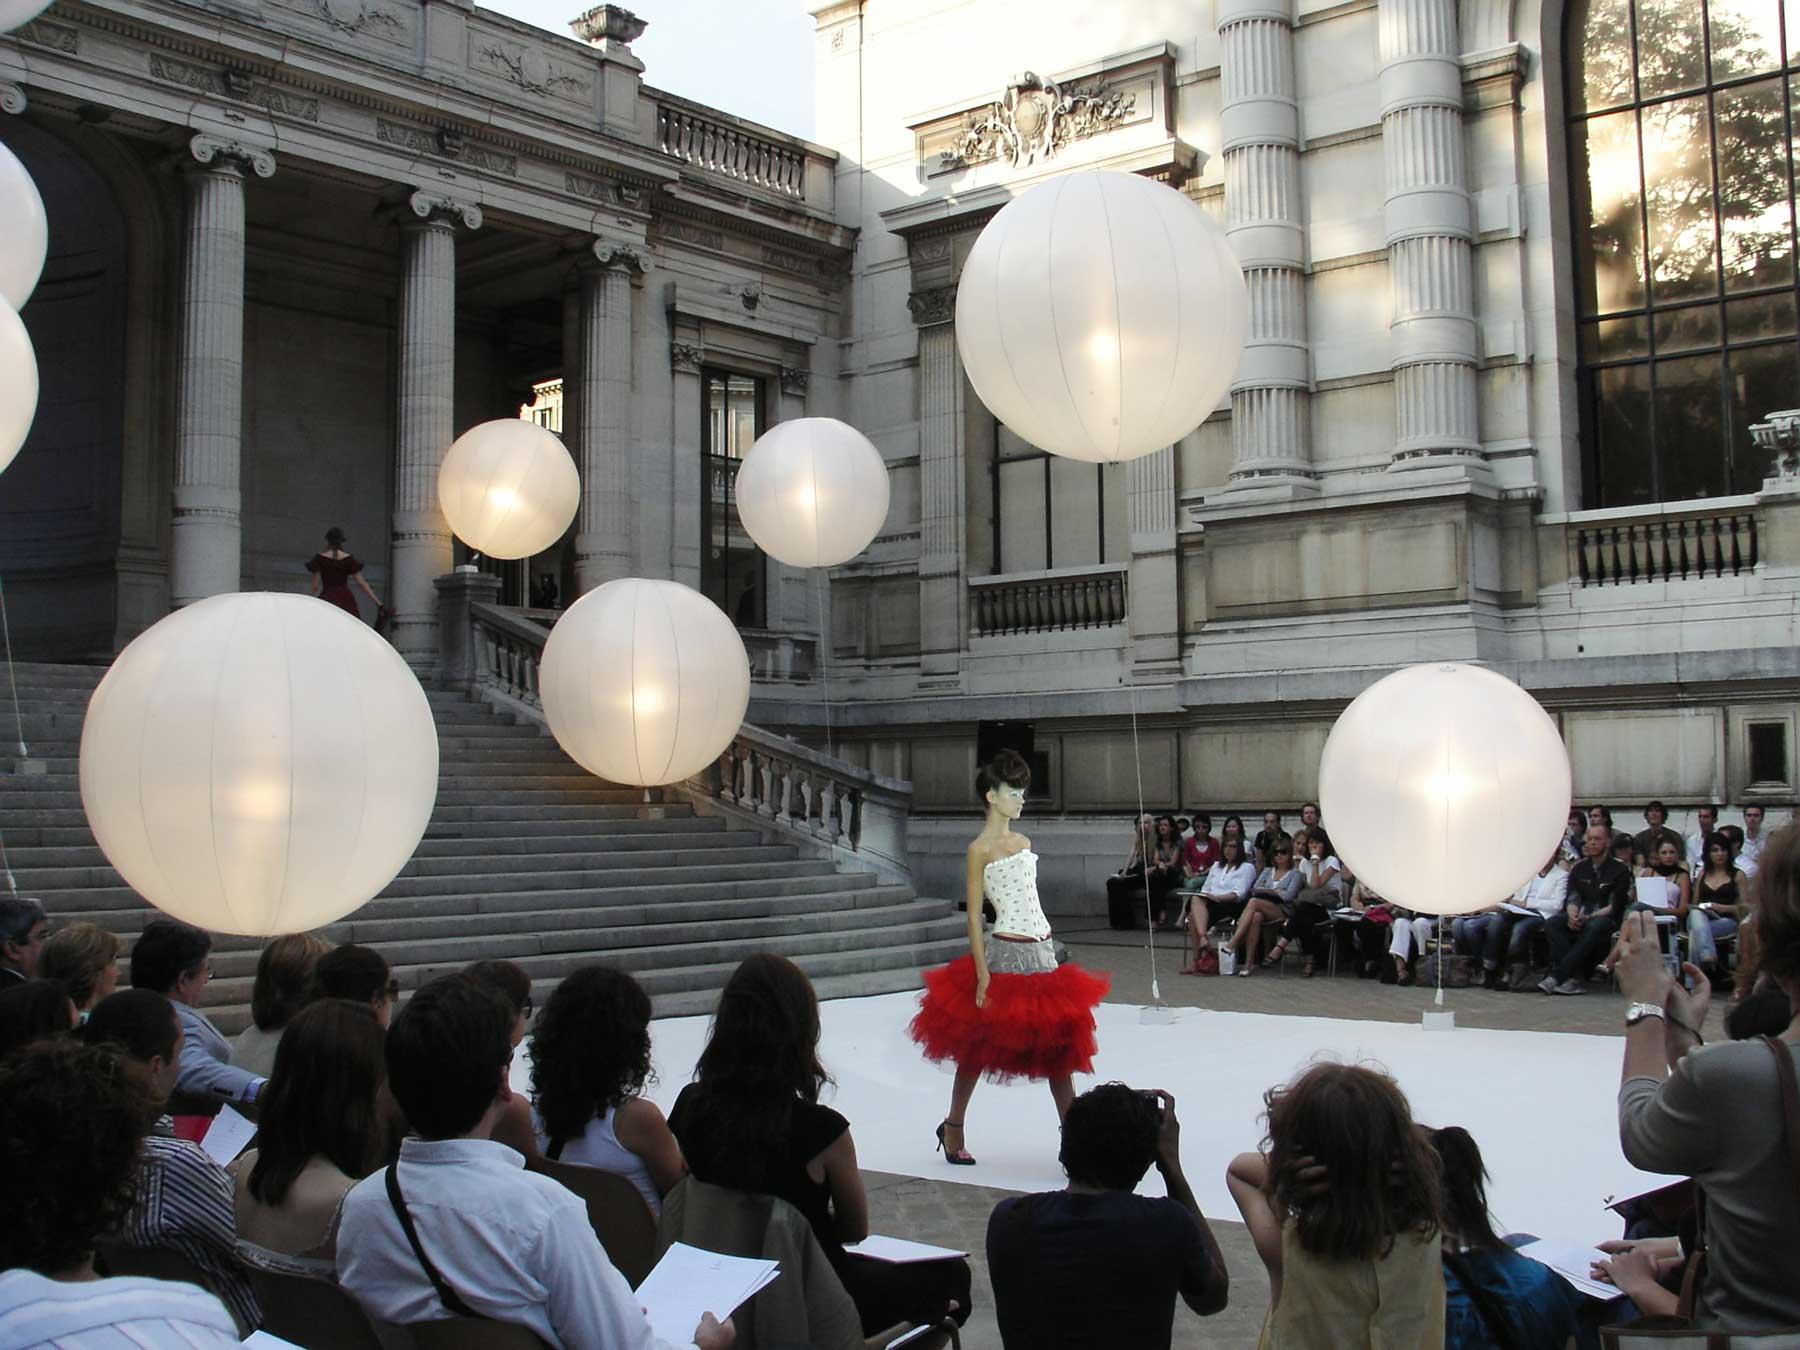 ballon-sphere-eclairant-tungstene-helium-defile-de-mode-palais-de-tokyo-fashionweek.jpg